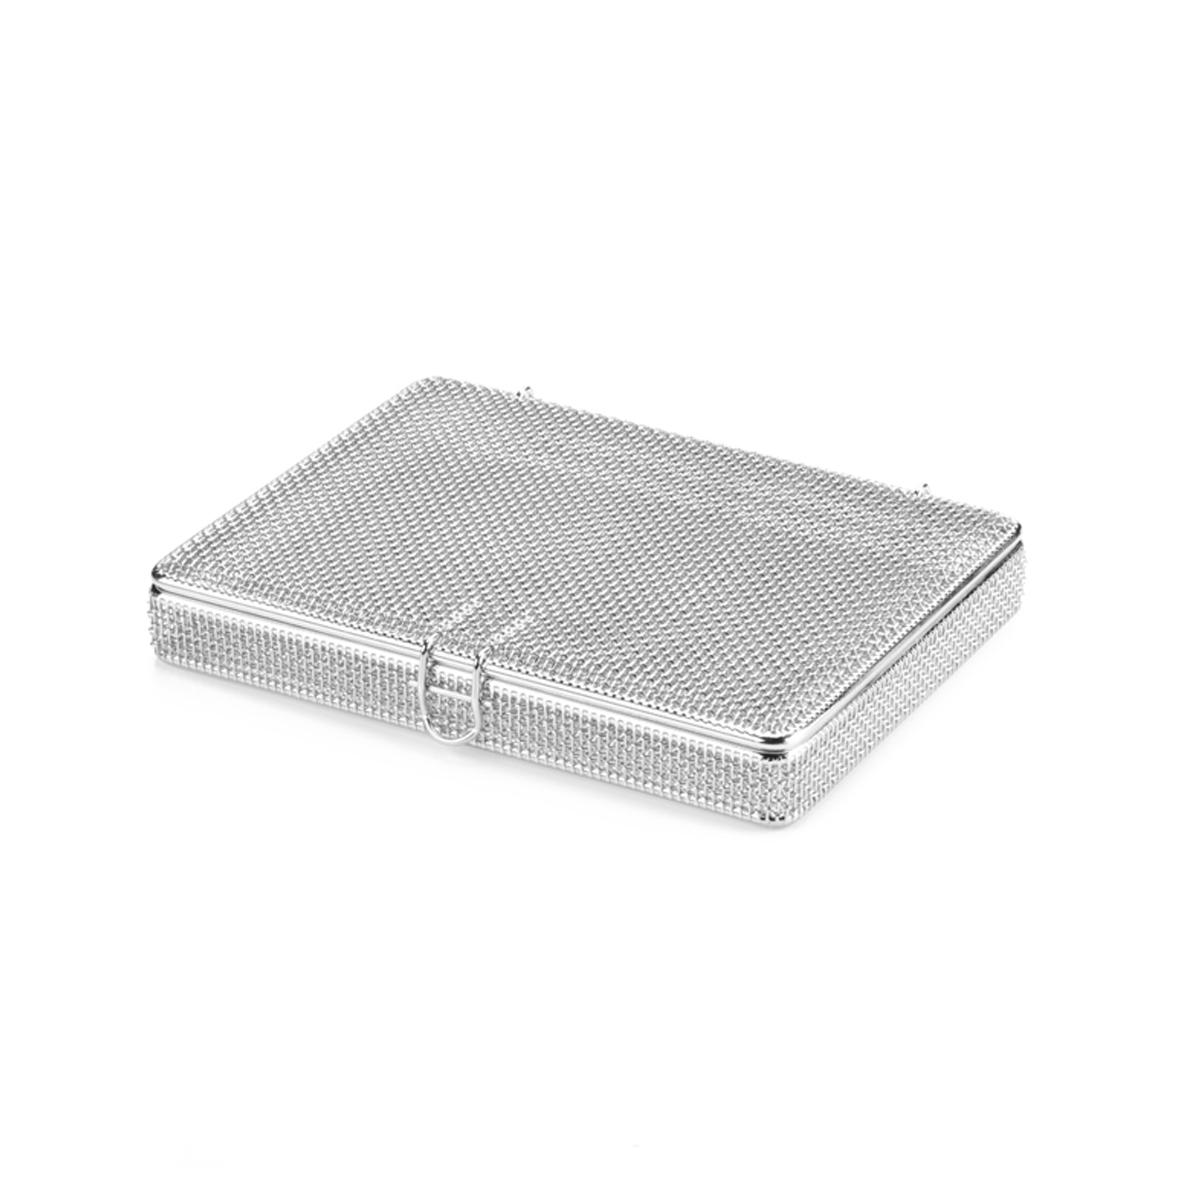 Micro Mesh Tray Image